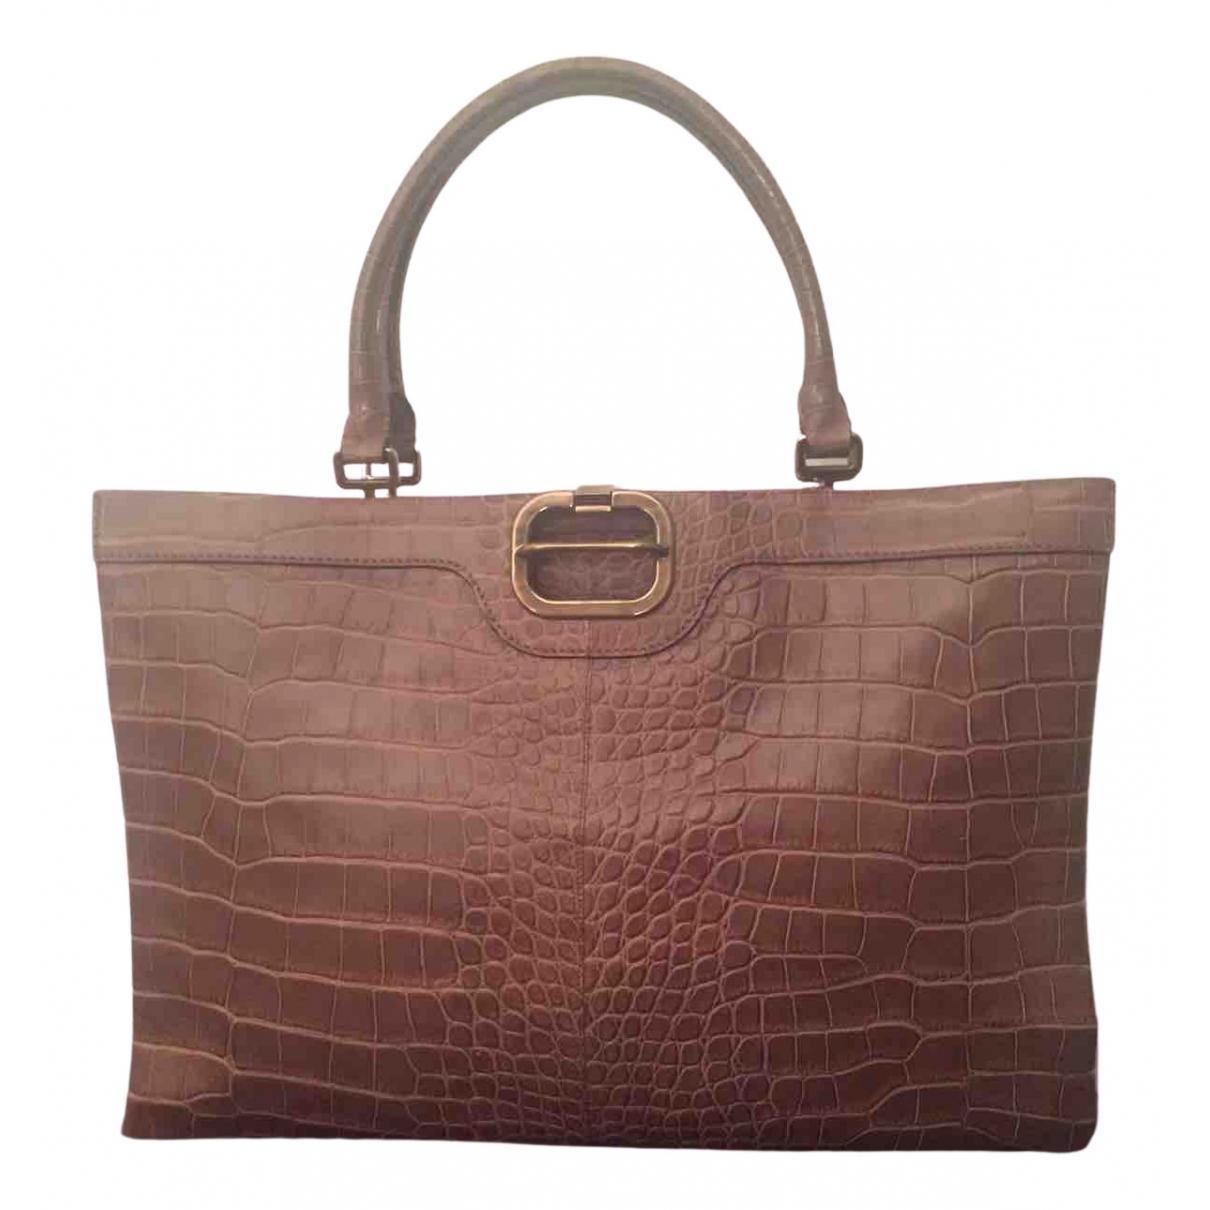 Roger Vivier N Camel Crocodile handbag for Women N